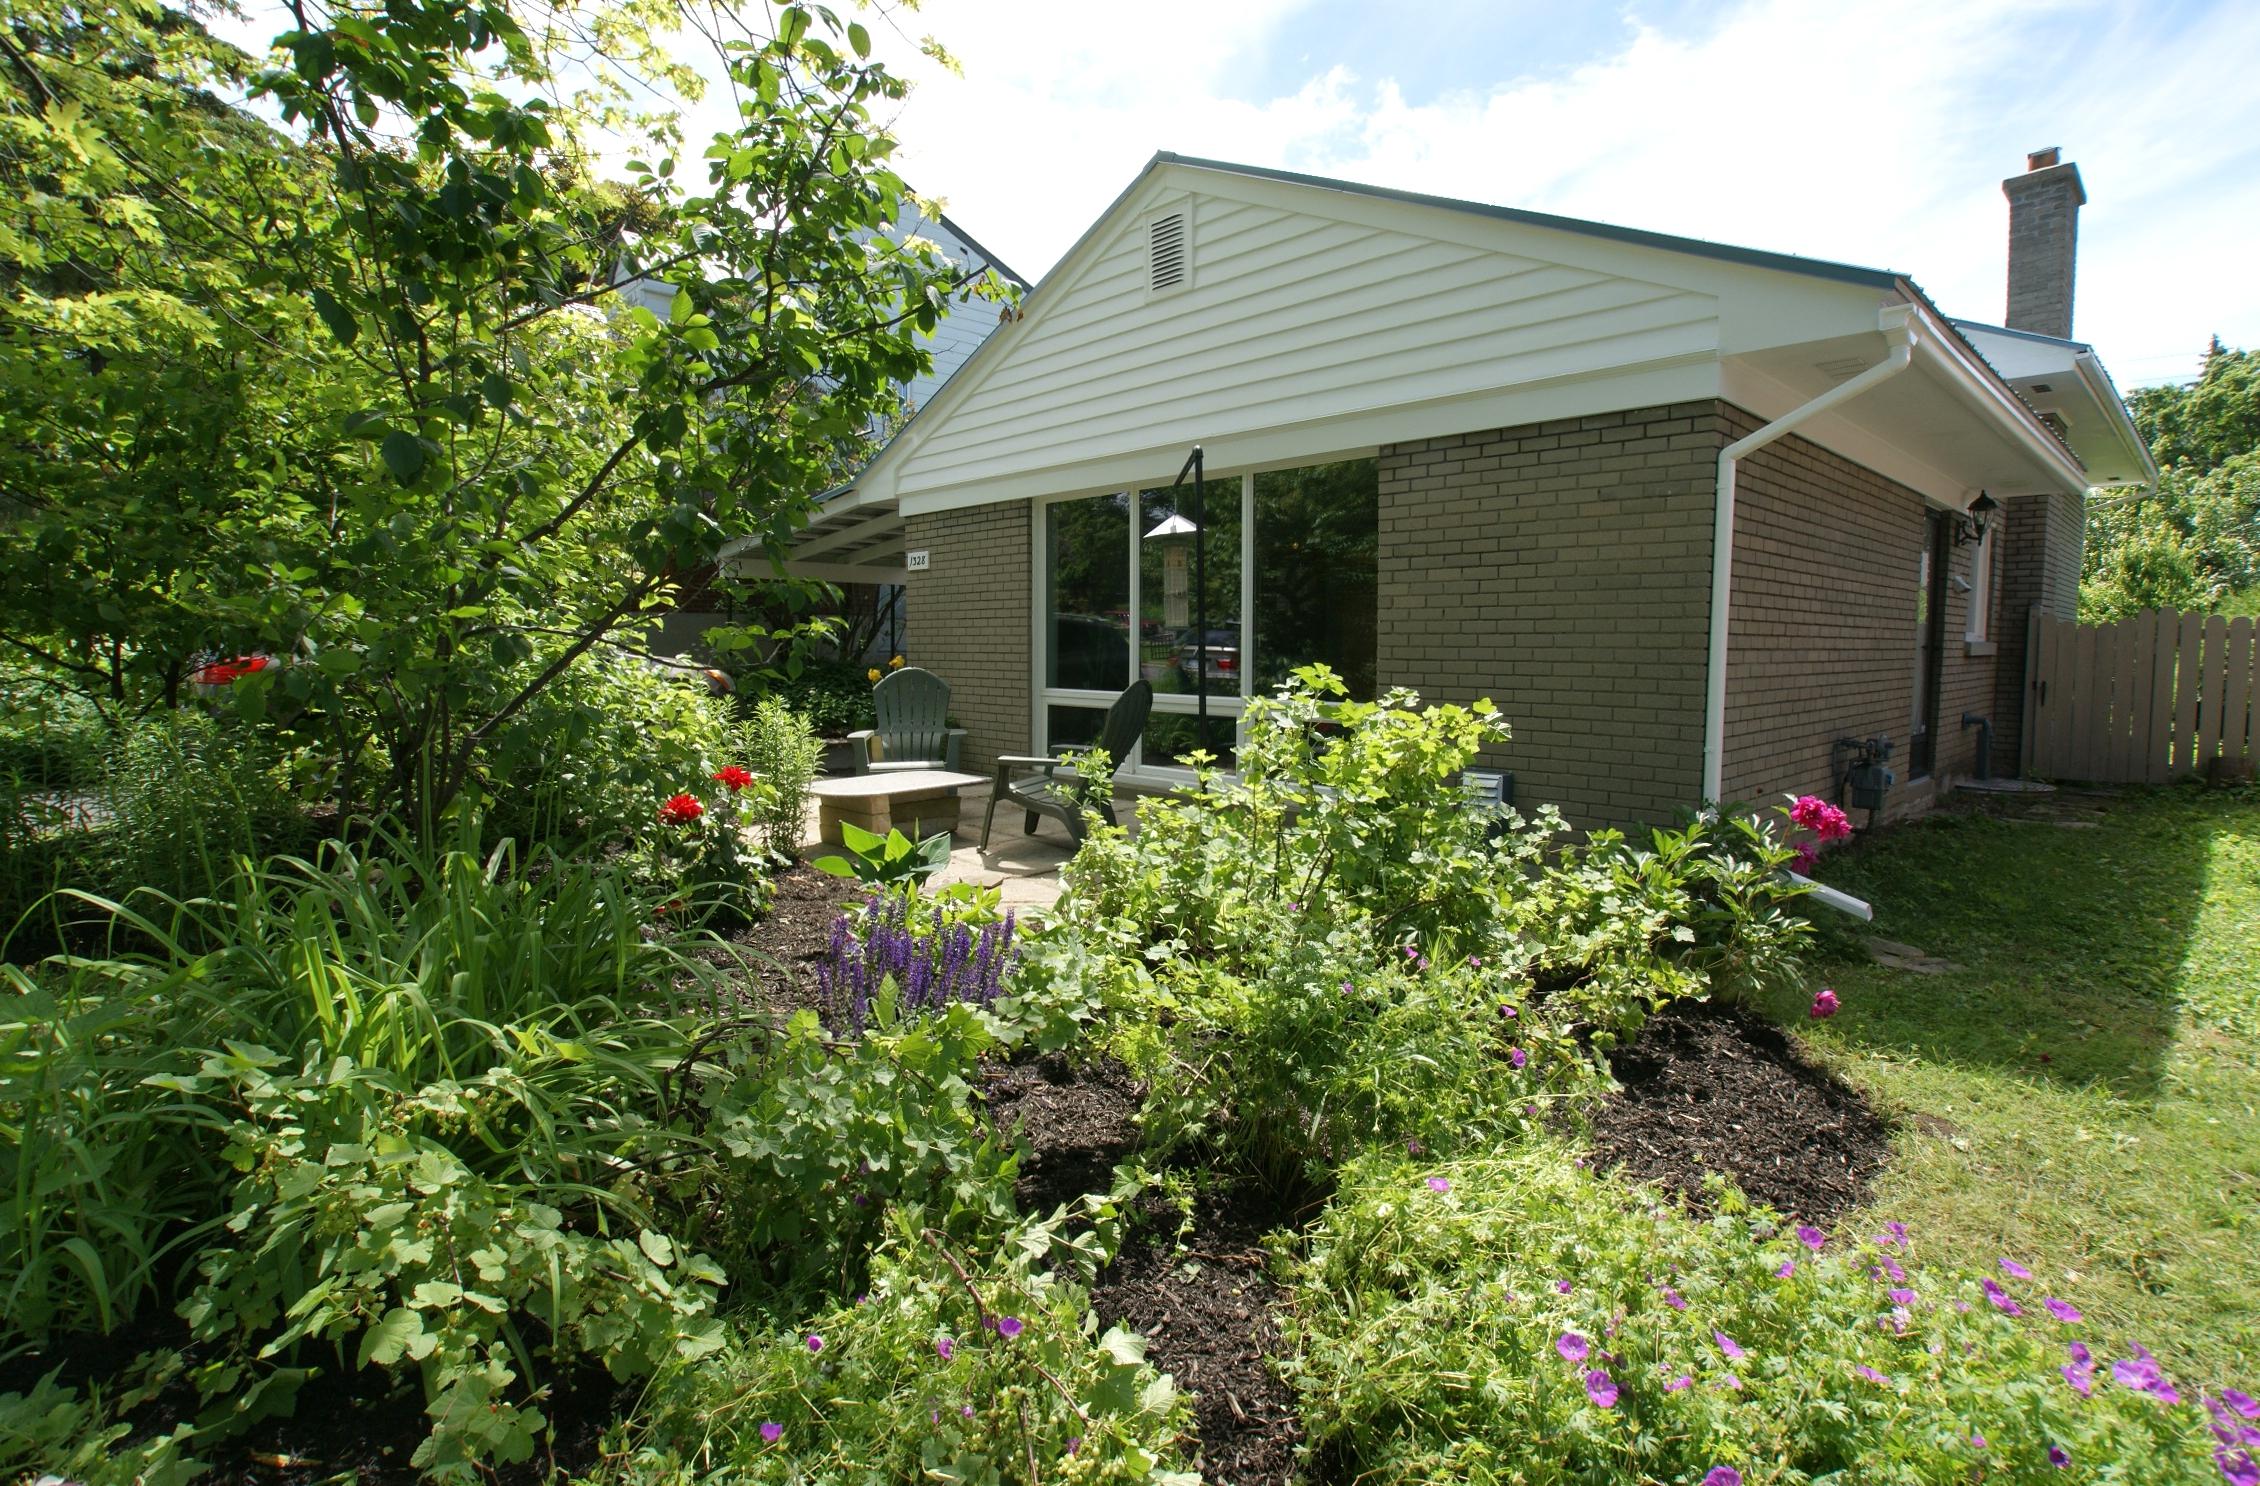 1328 Snowdon St – Sold June 2017